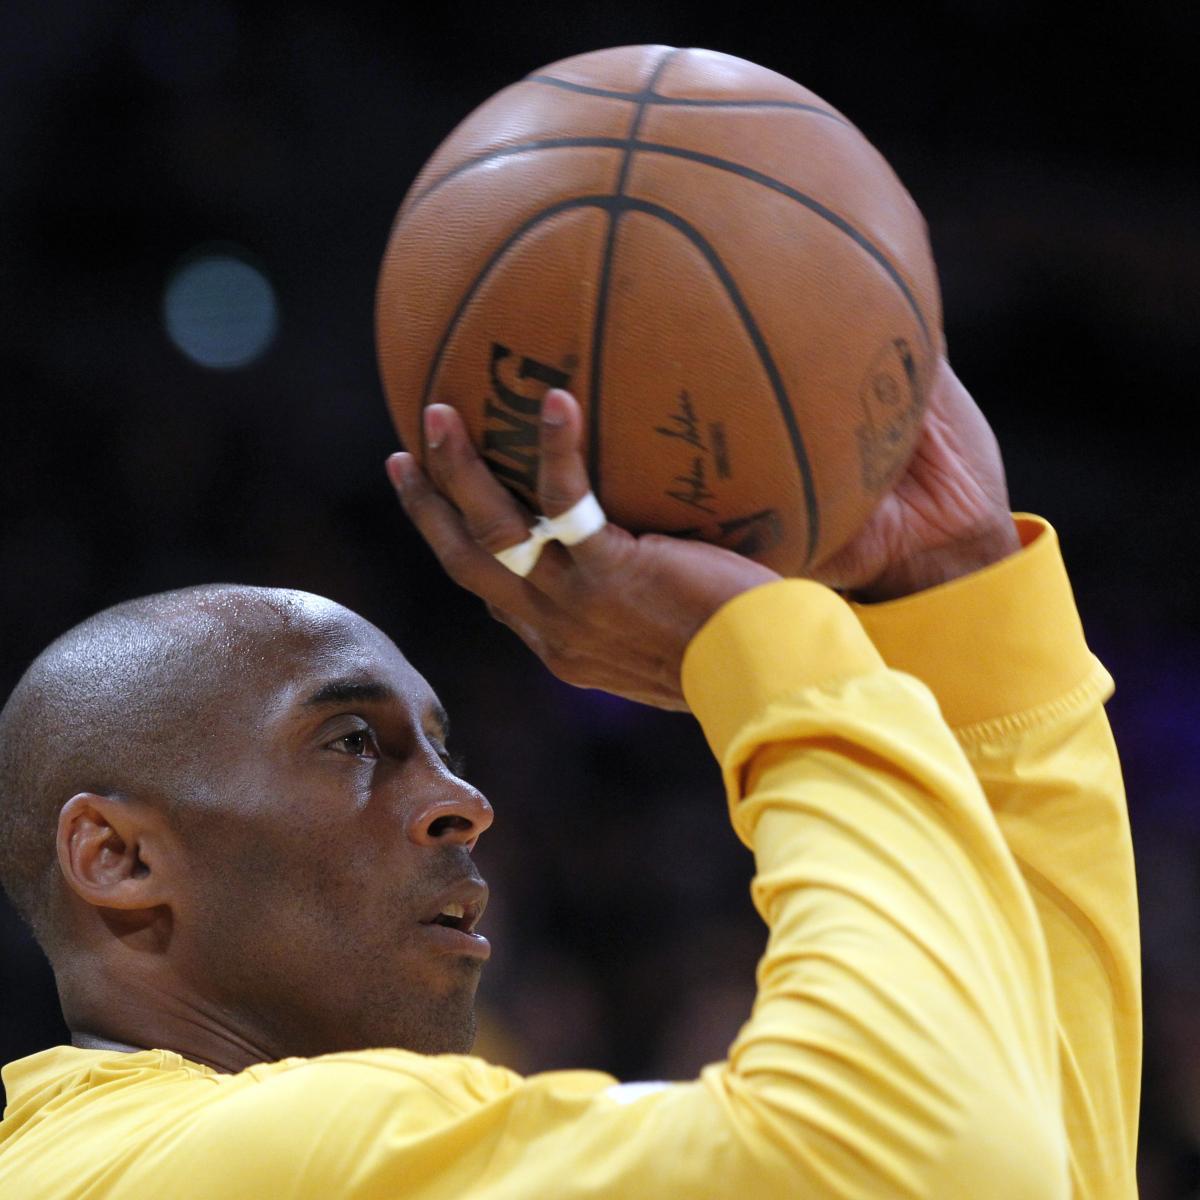 Kobe Bryant's 'The Wizenard Series: Season One' Book Given Posthumous Release